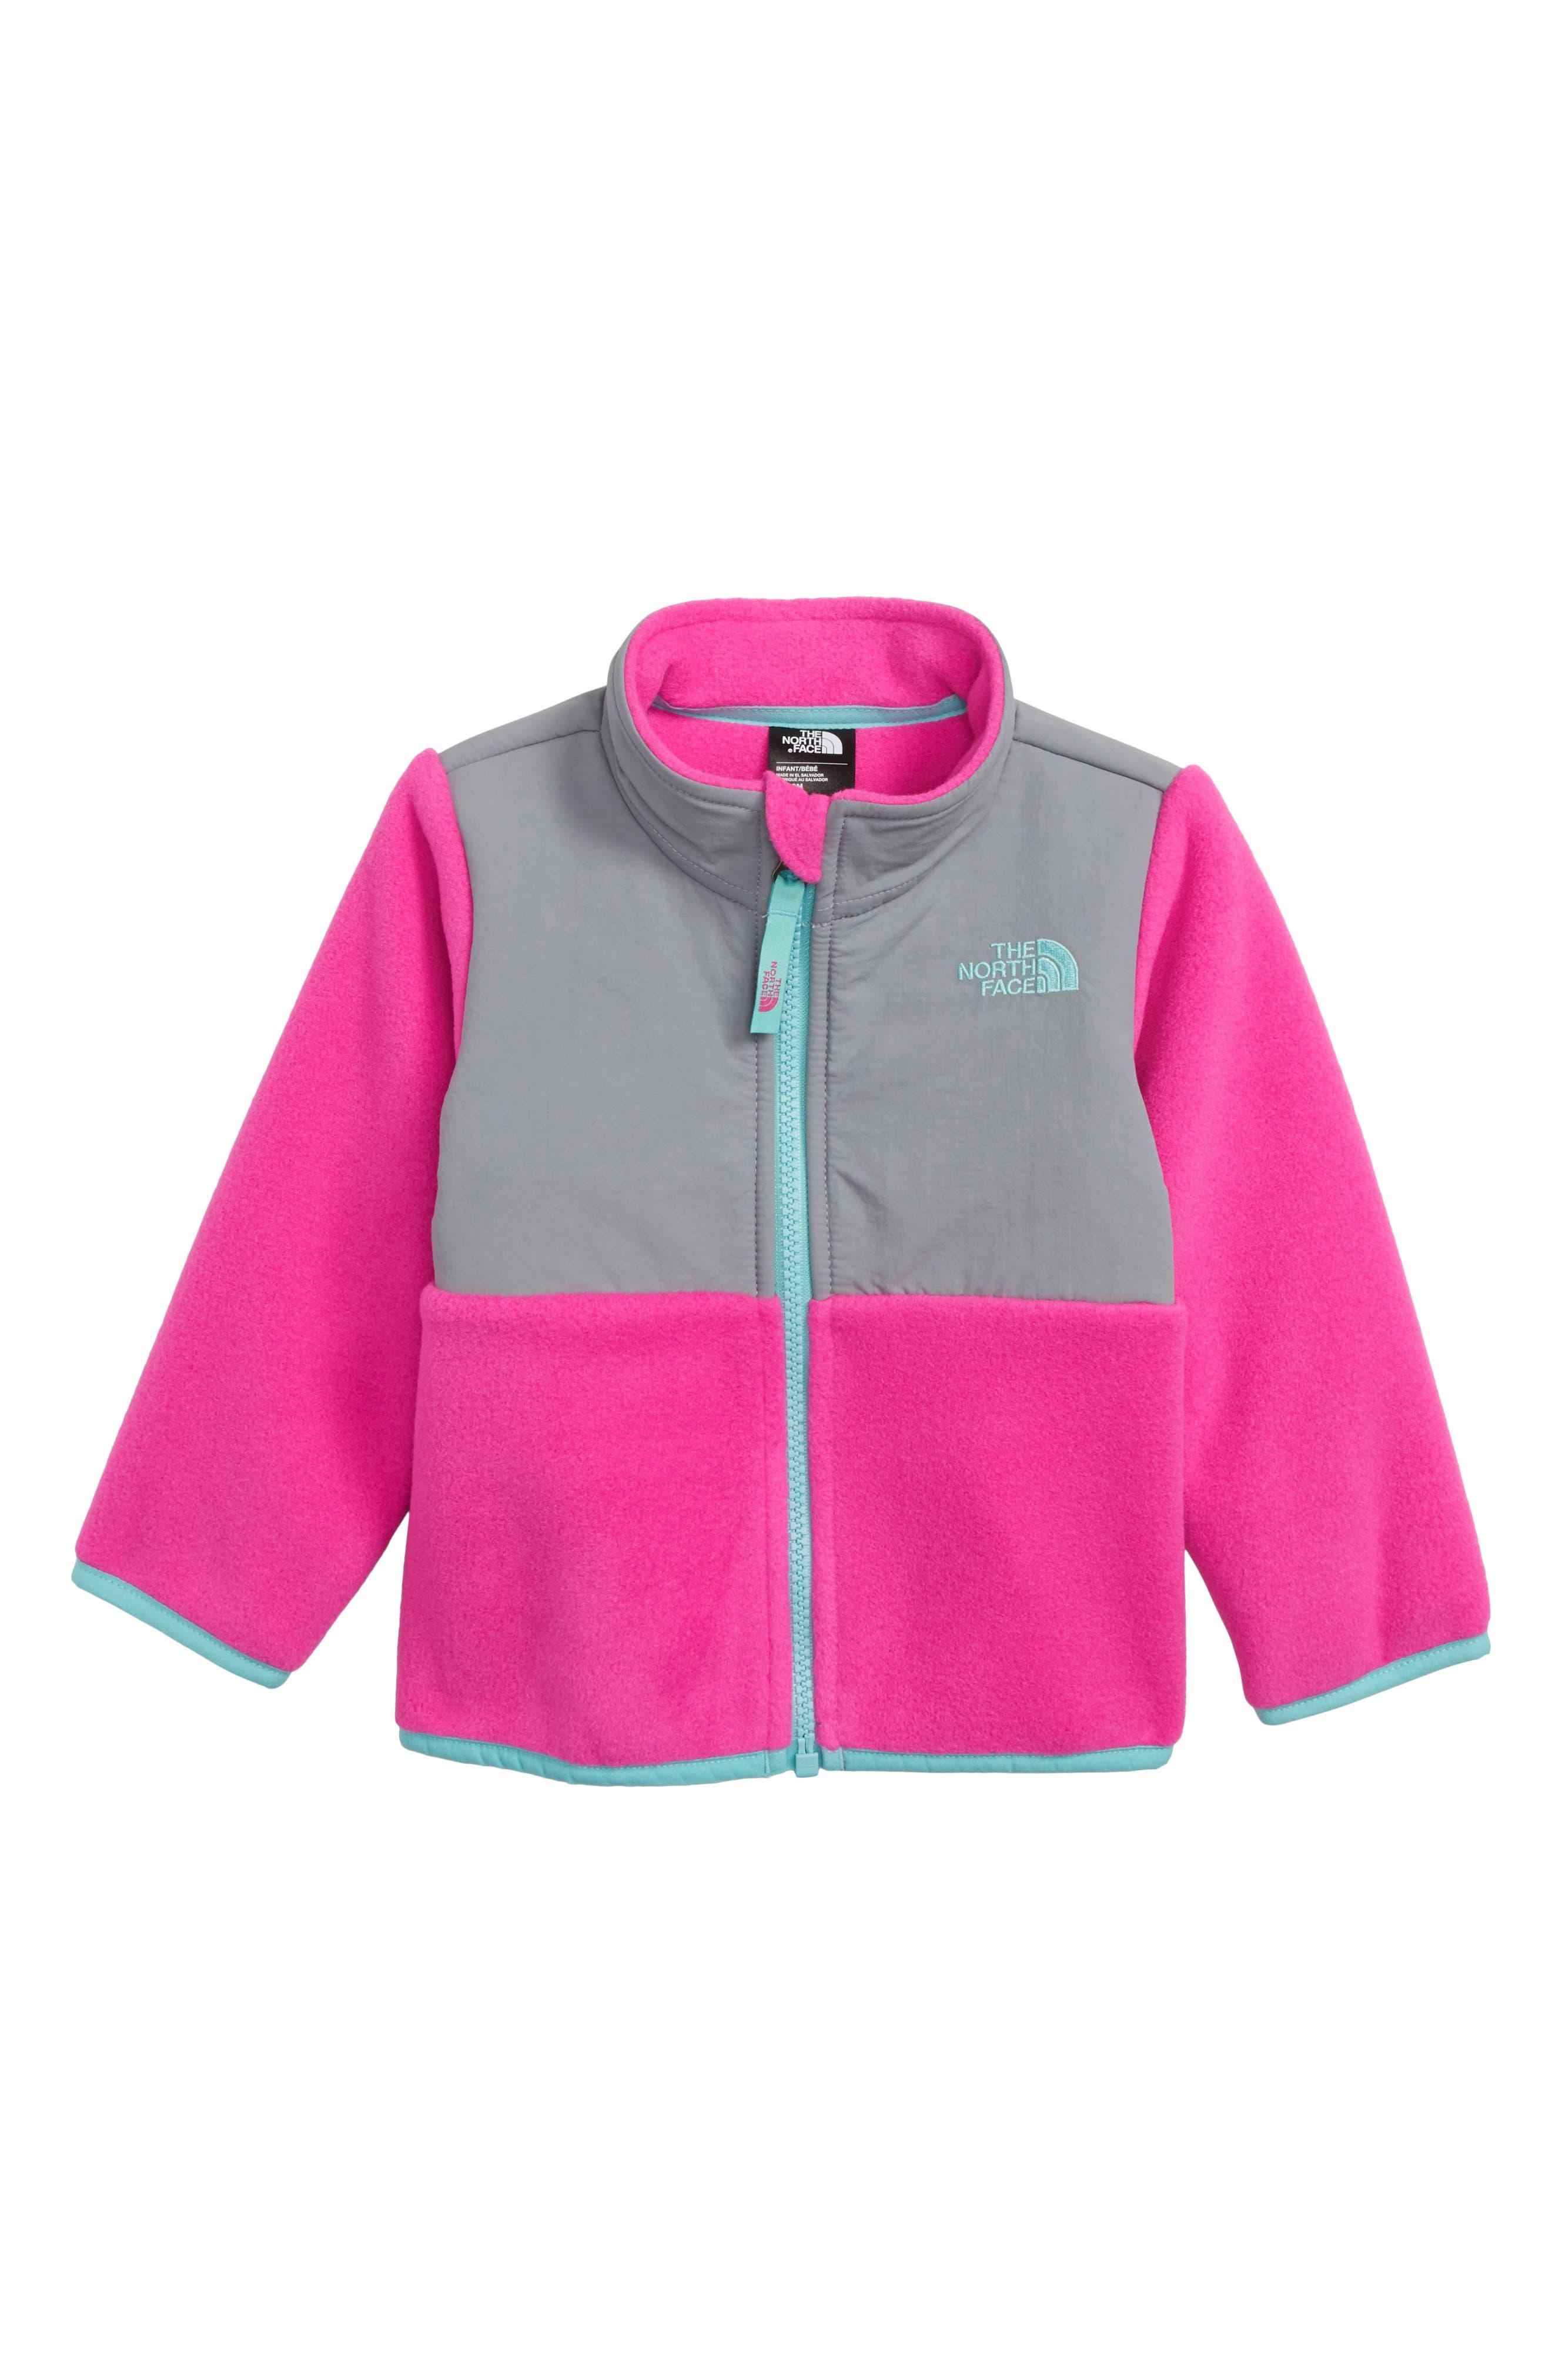 THE NORTH FACE Denali Thermal Fleece Jacket, Main, color, AZALEA PINK